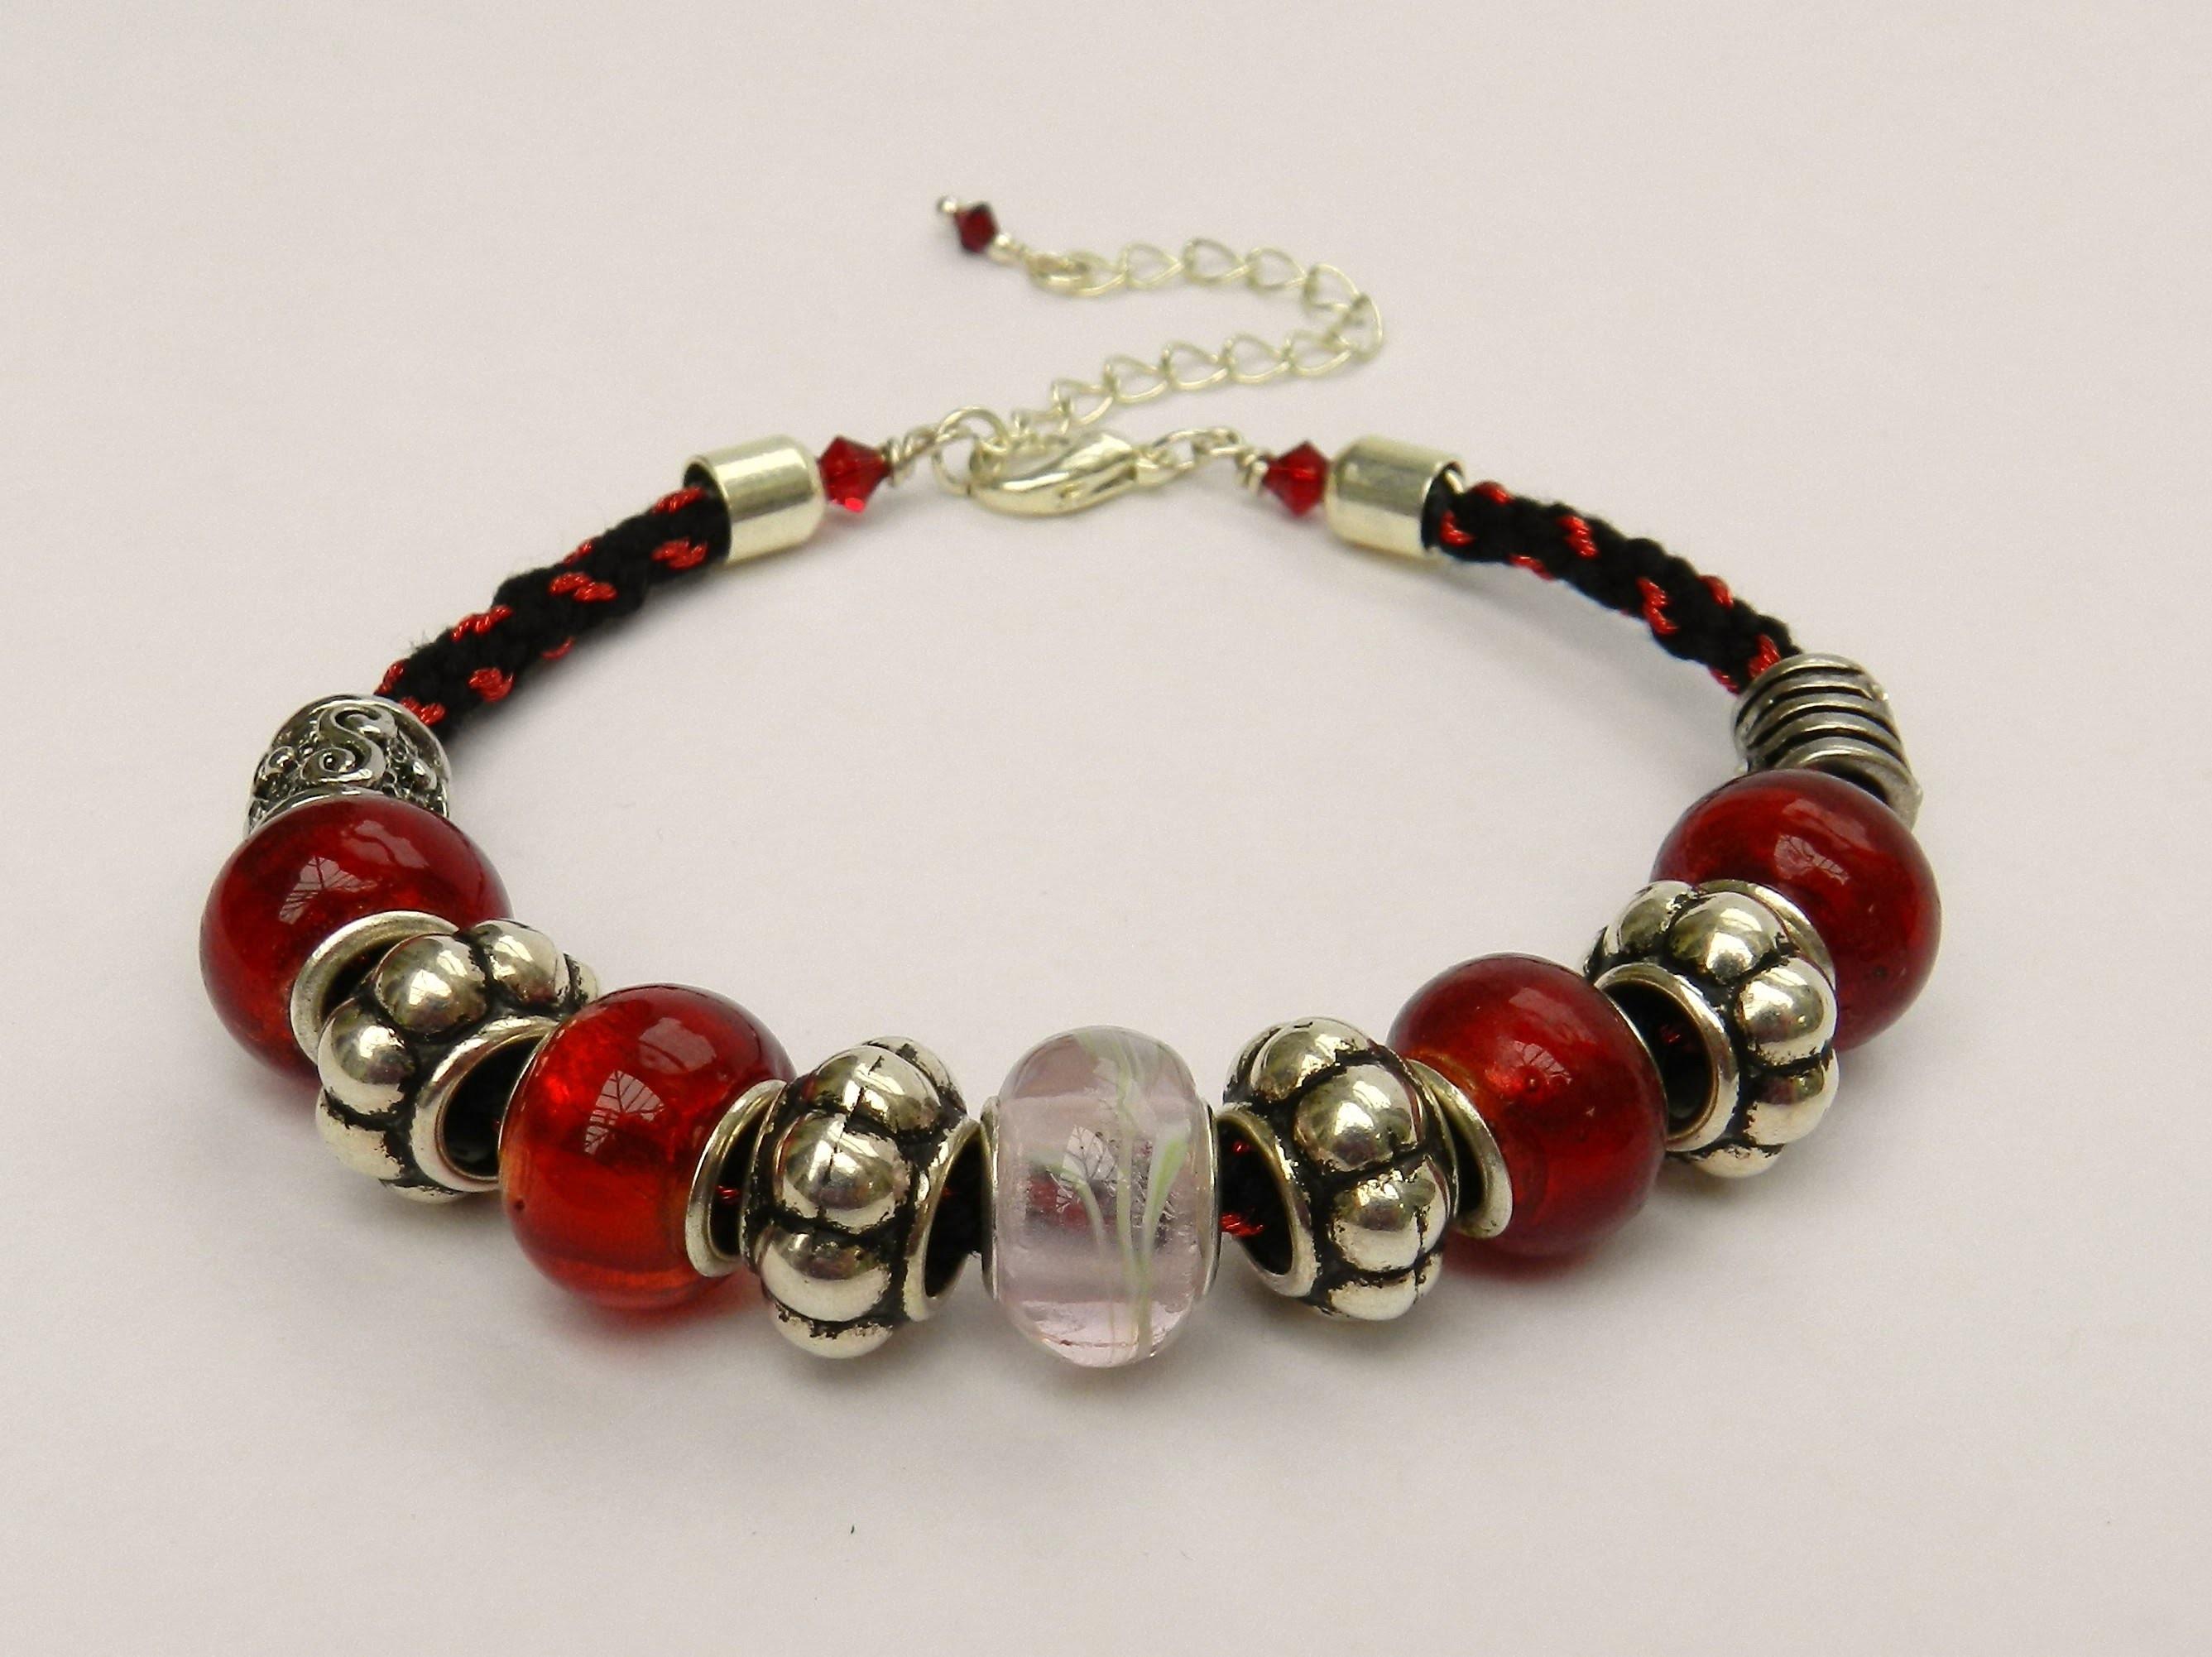 How to make bracelets with beads, threads - DIY friendship bracelet